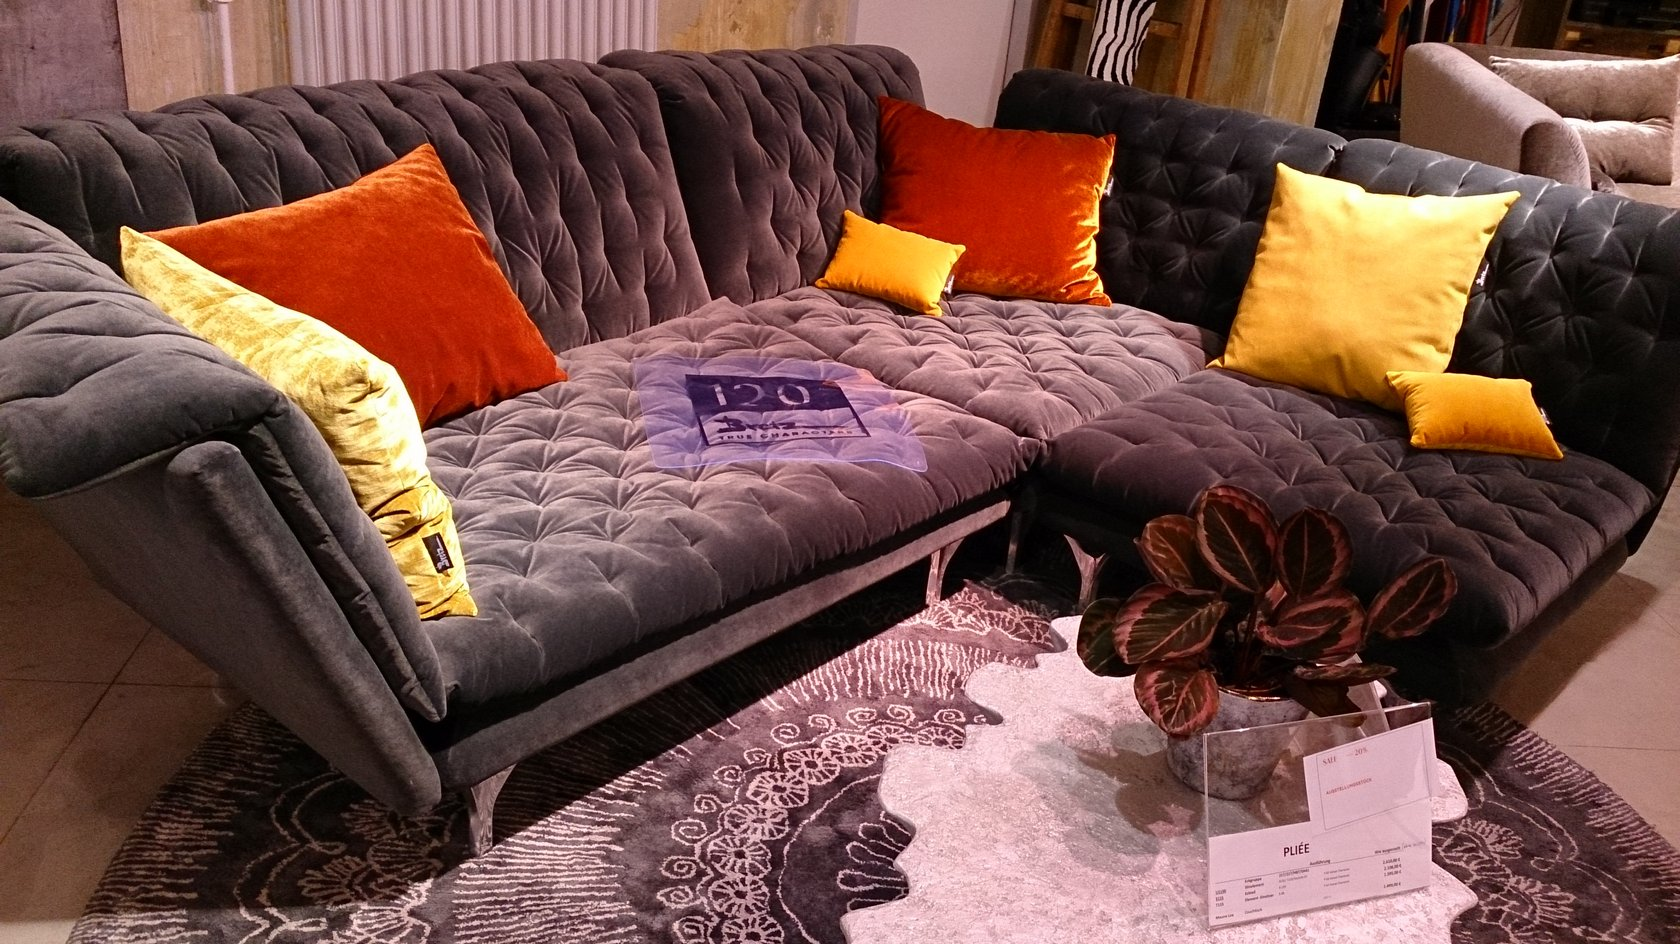 bretz sales pliee bretz store frankfurt. Black Bedroom Furniture Sets. Home Design Ideas